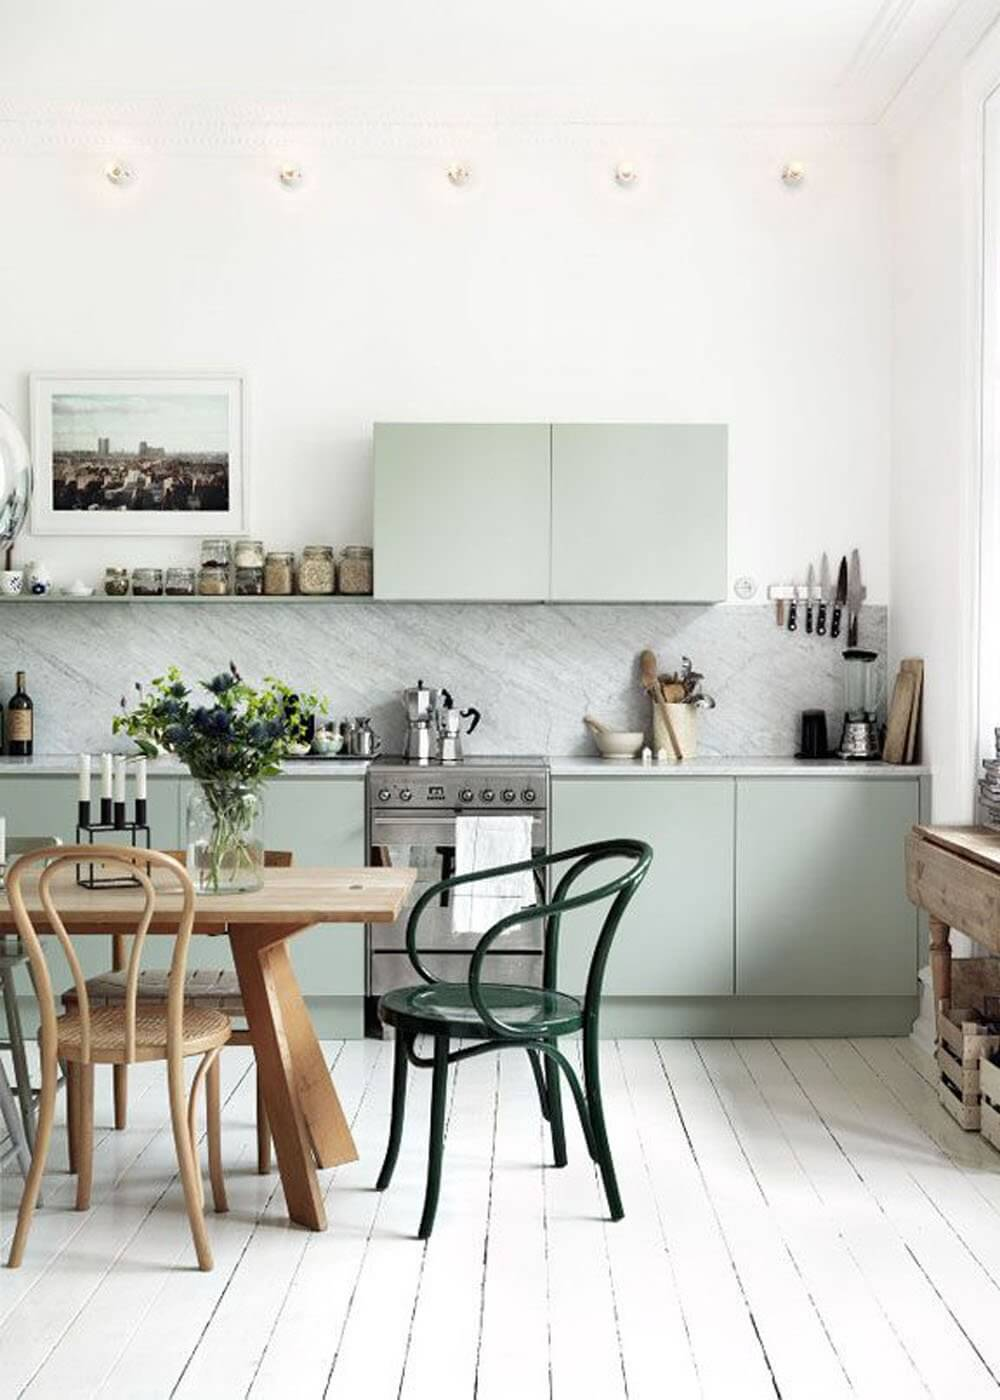 inspiration du mint dans la cuisine frenchy fancy. Black Bedroom Furniture Sets. Home Design Ideas